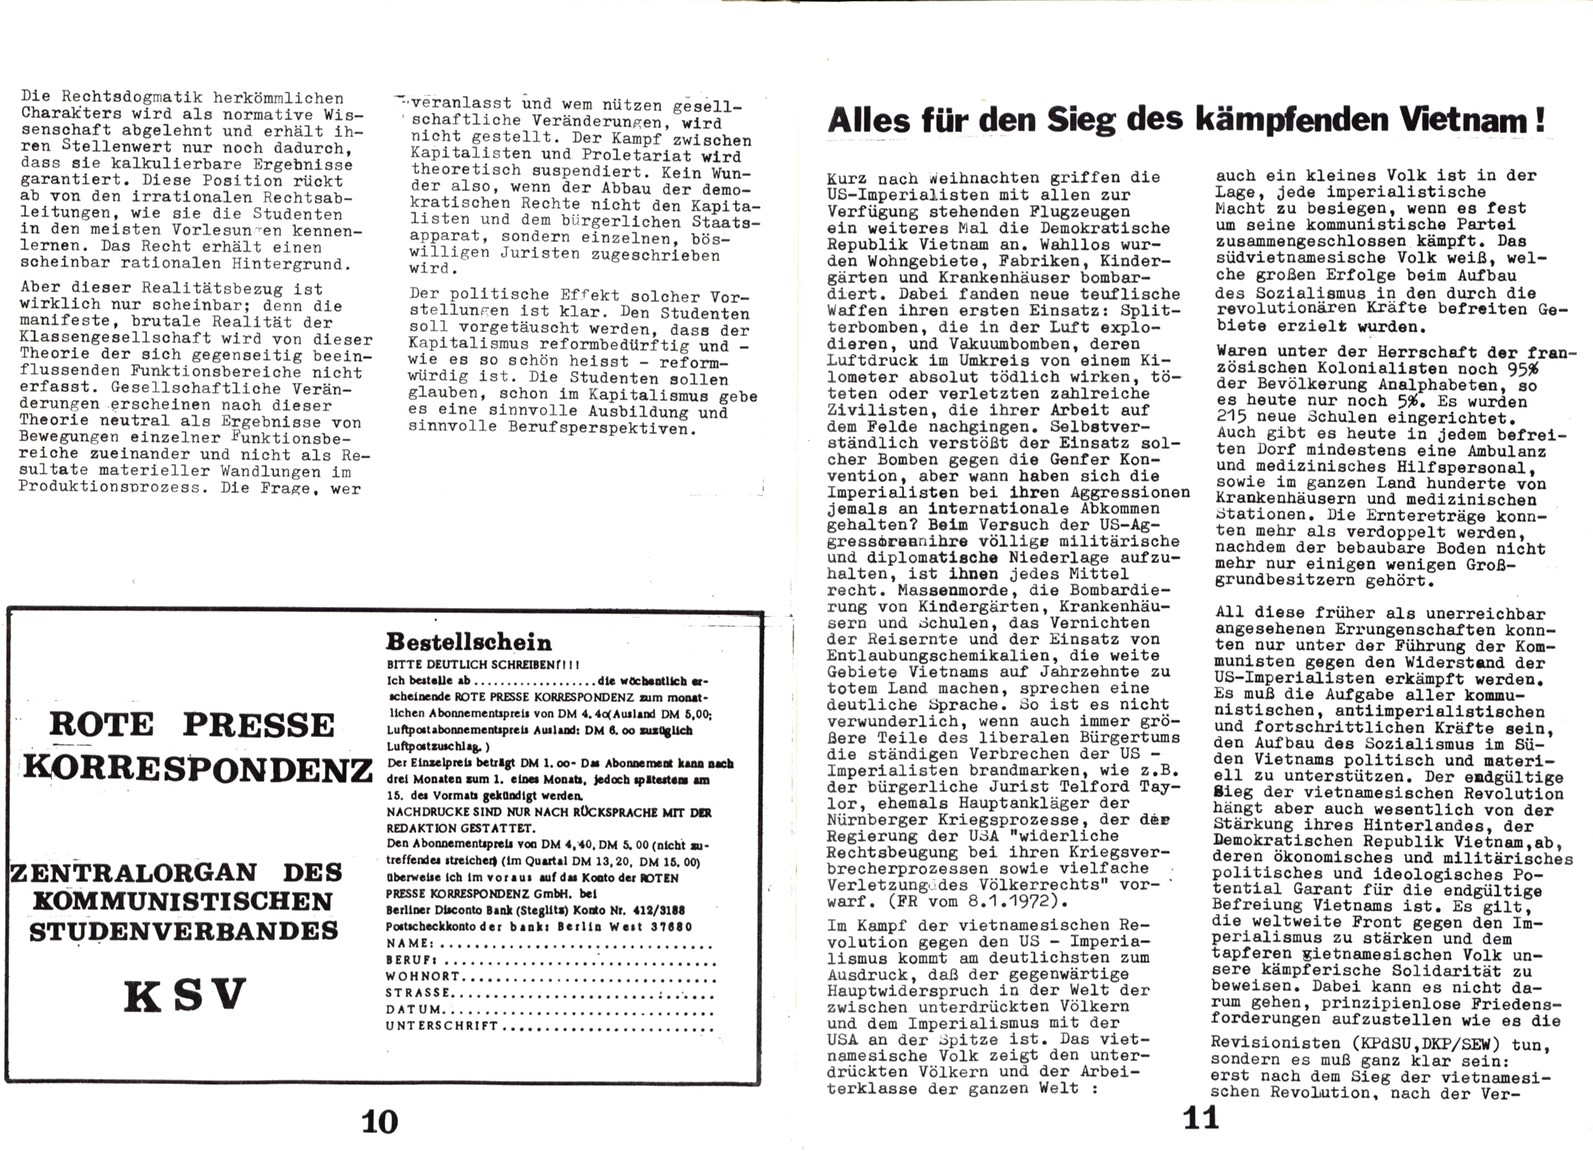 Berlin_KSV_Jura_Studentenpresse_19720115_06_06